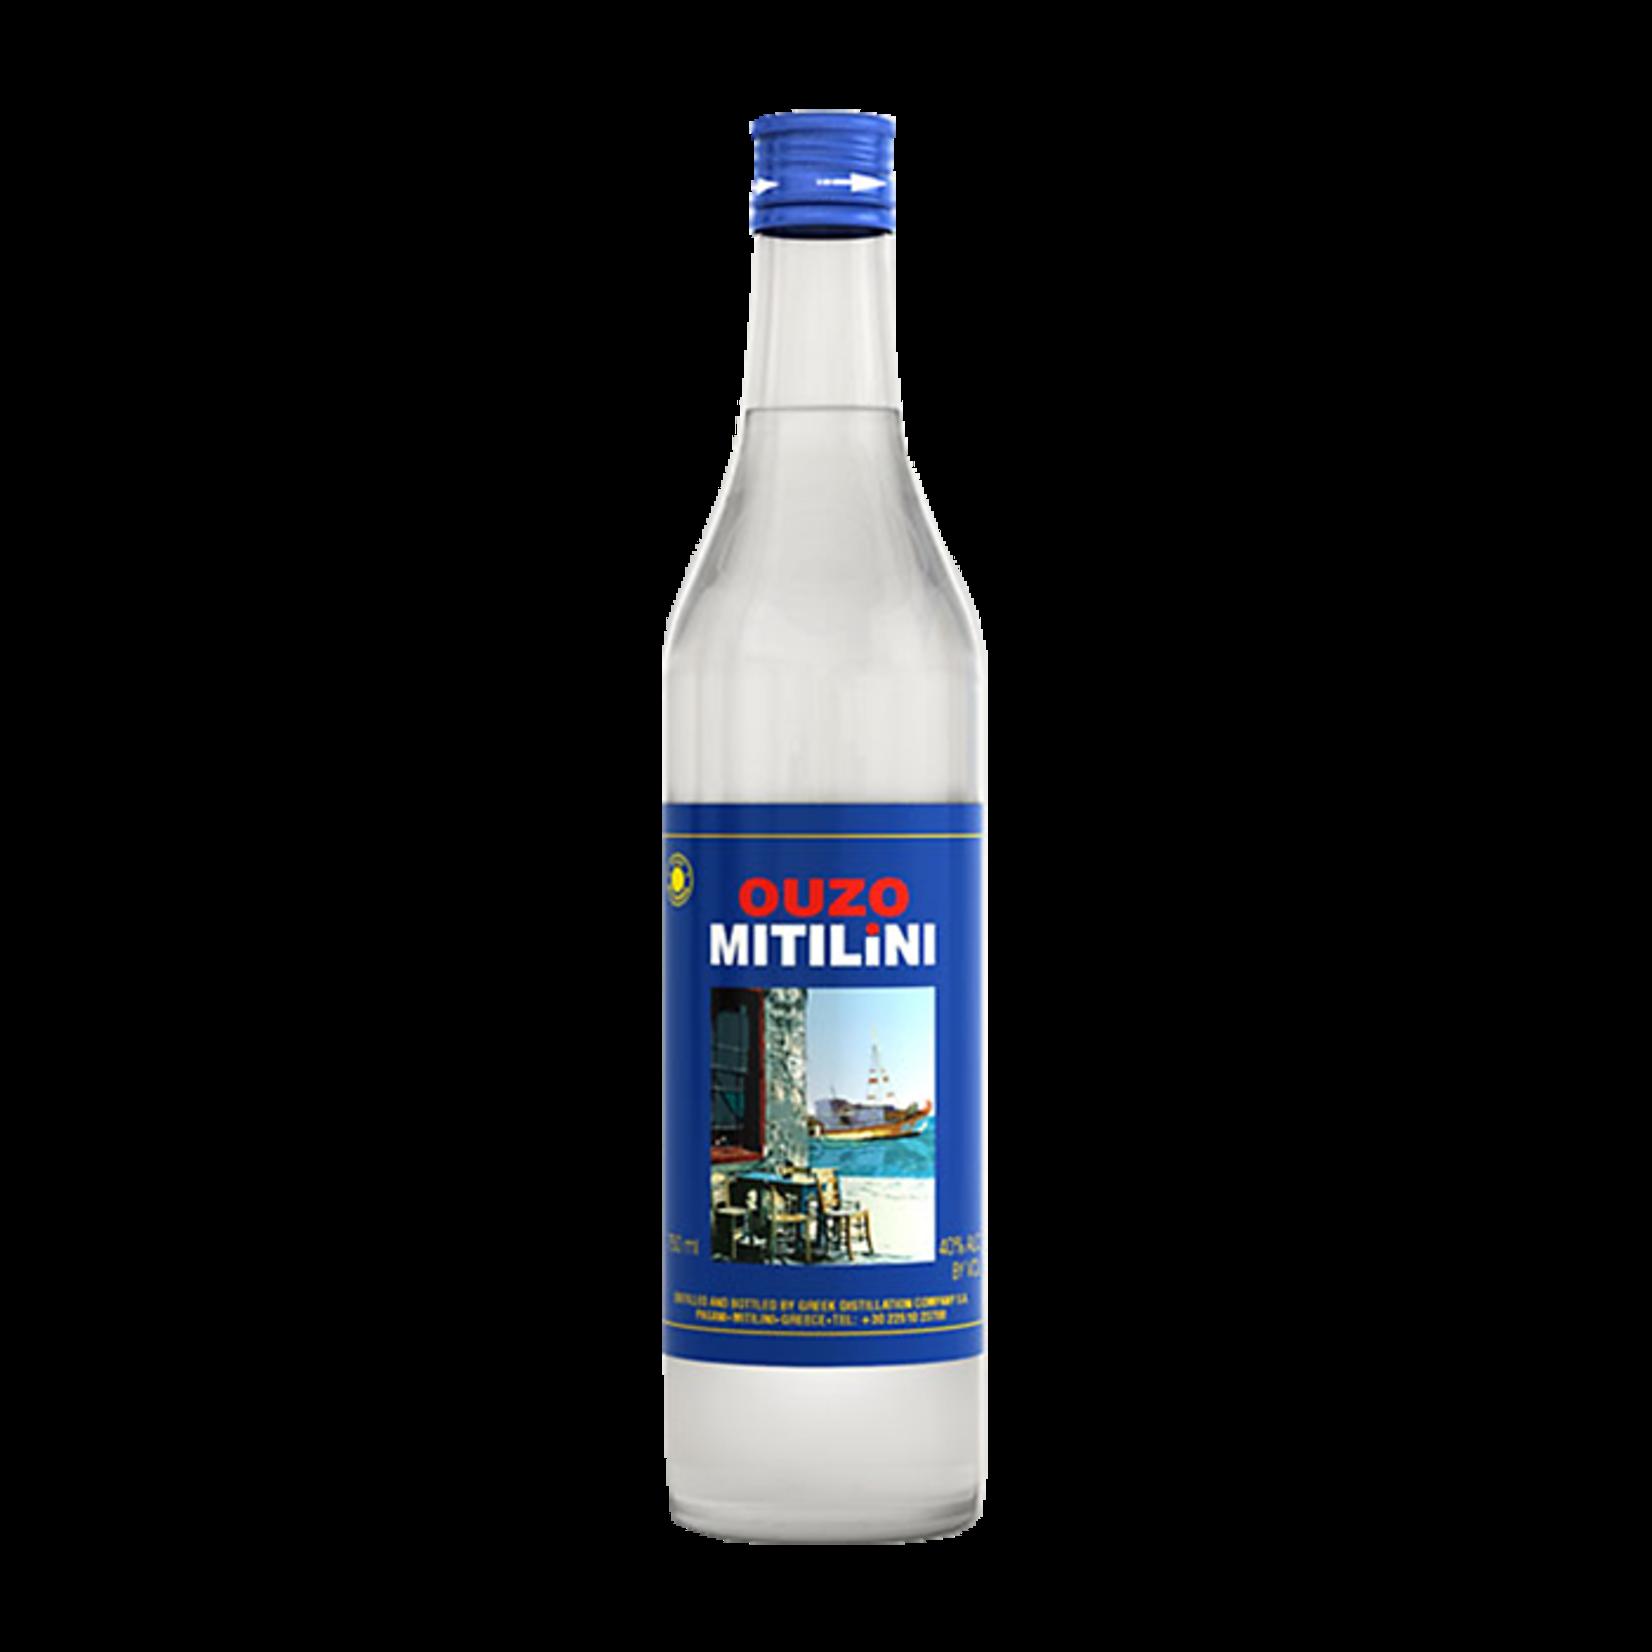 Spirits Mitilini Cooperative Ouzo